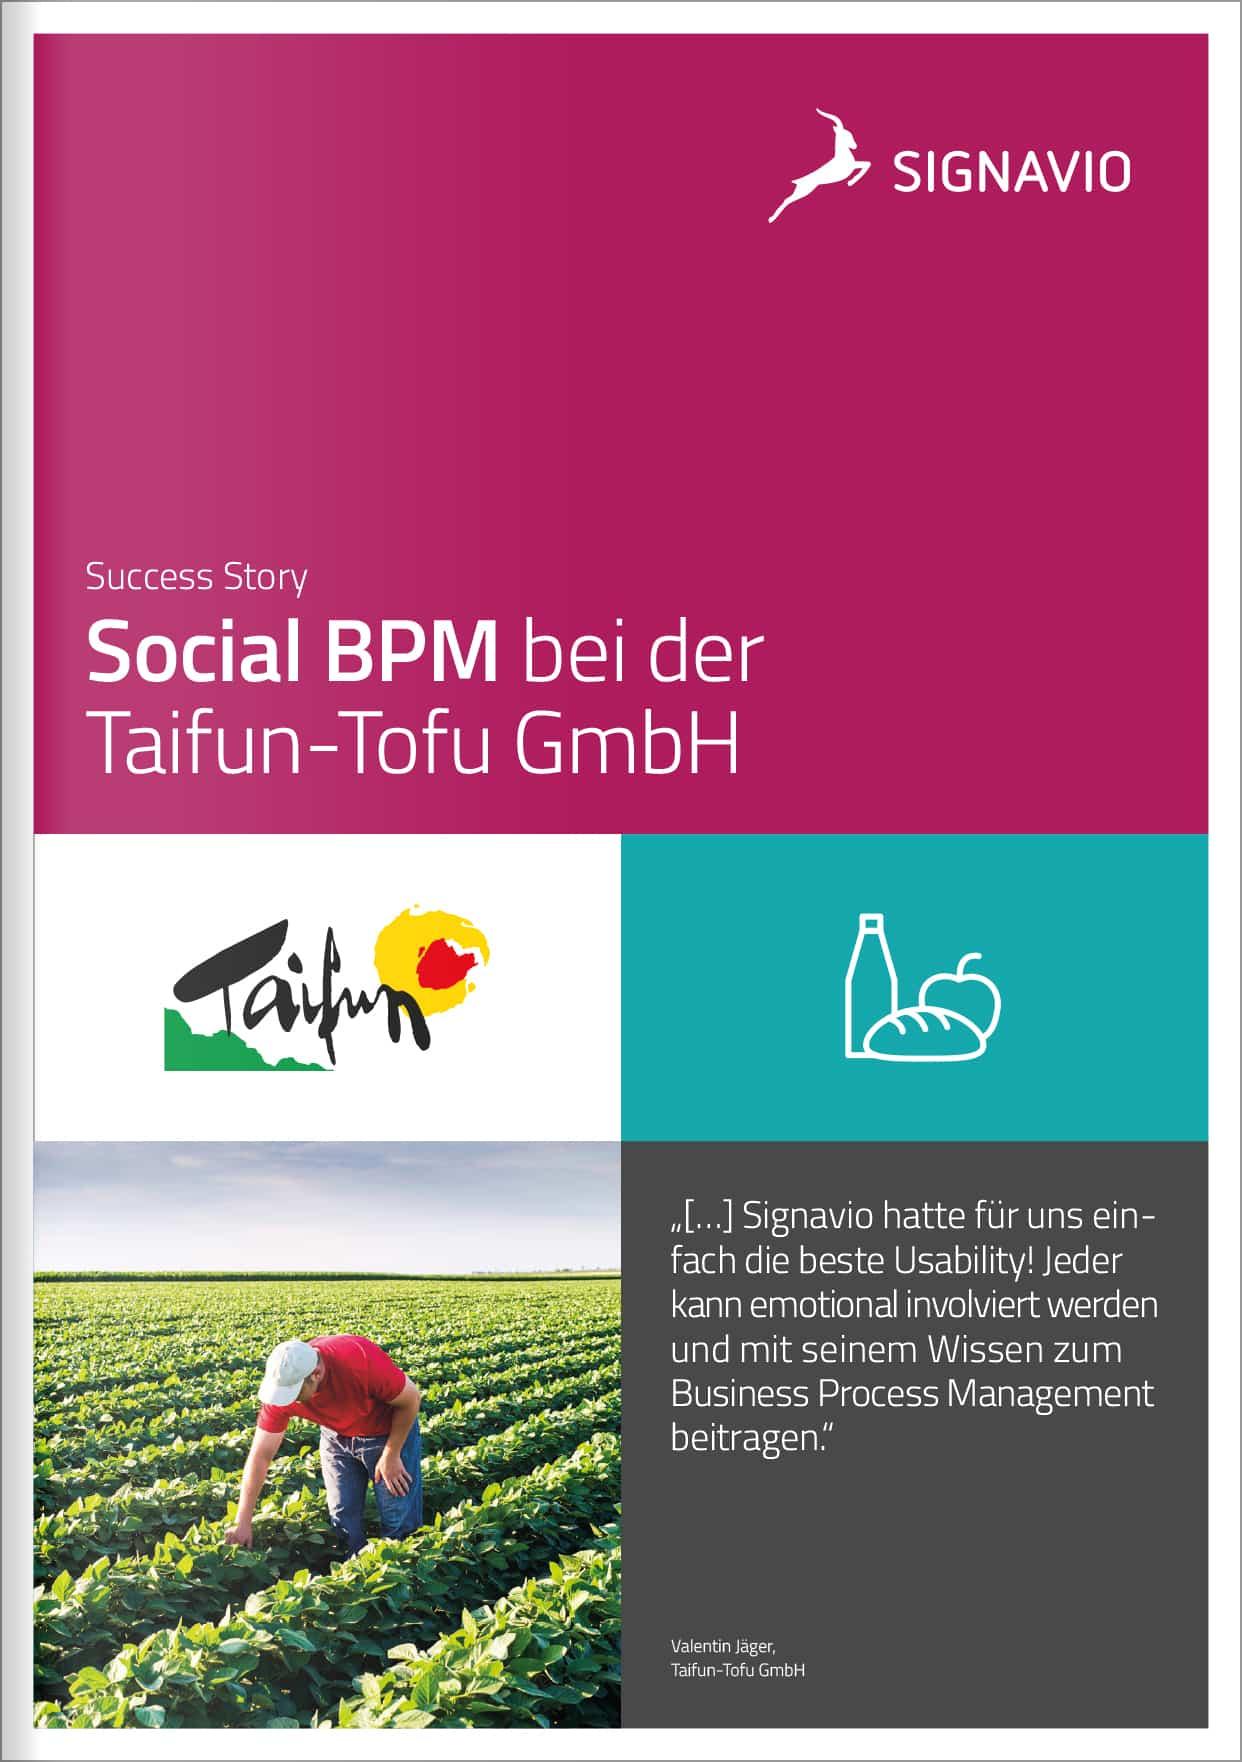 Success Story - Social BPM bei der Taifun-Tofu GmbH